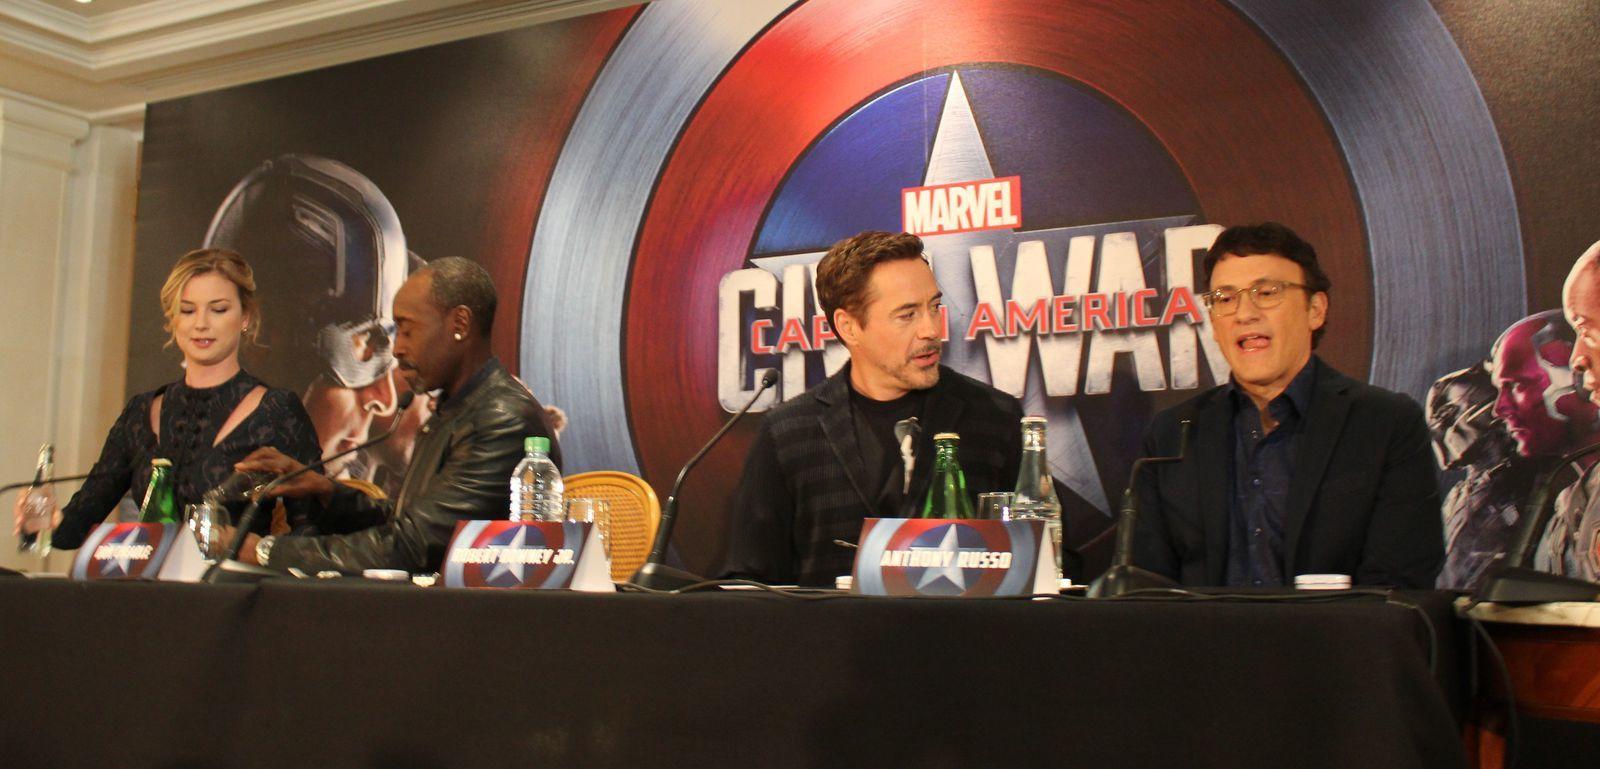 [critique] Captain America : Civil War